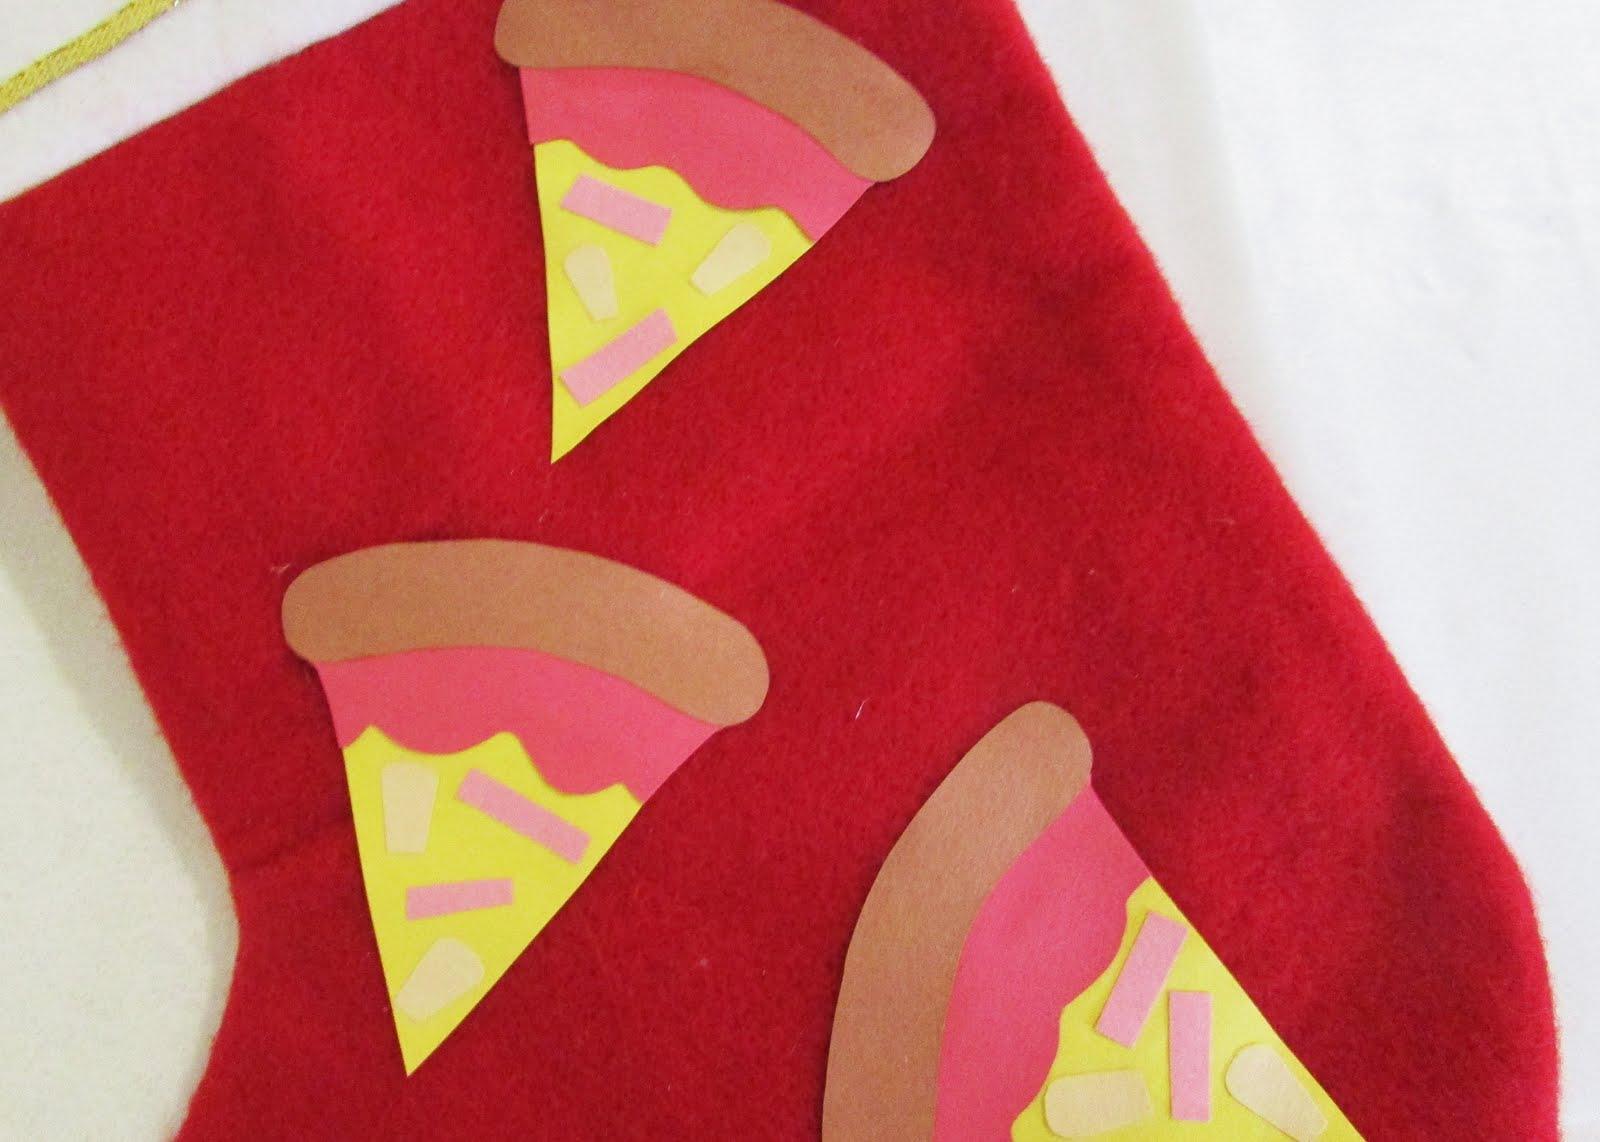 DIY Personalised Christmas Stocking - Two Ways!